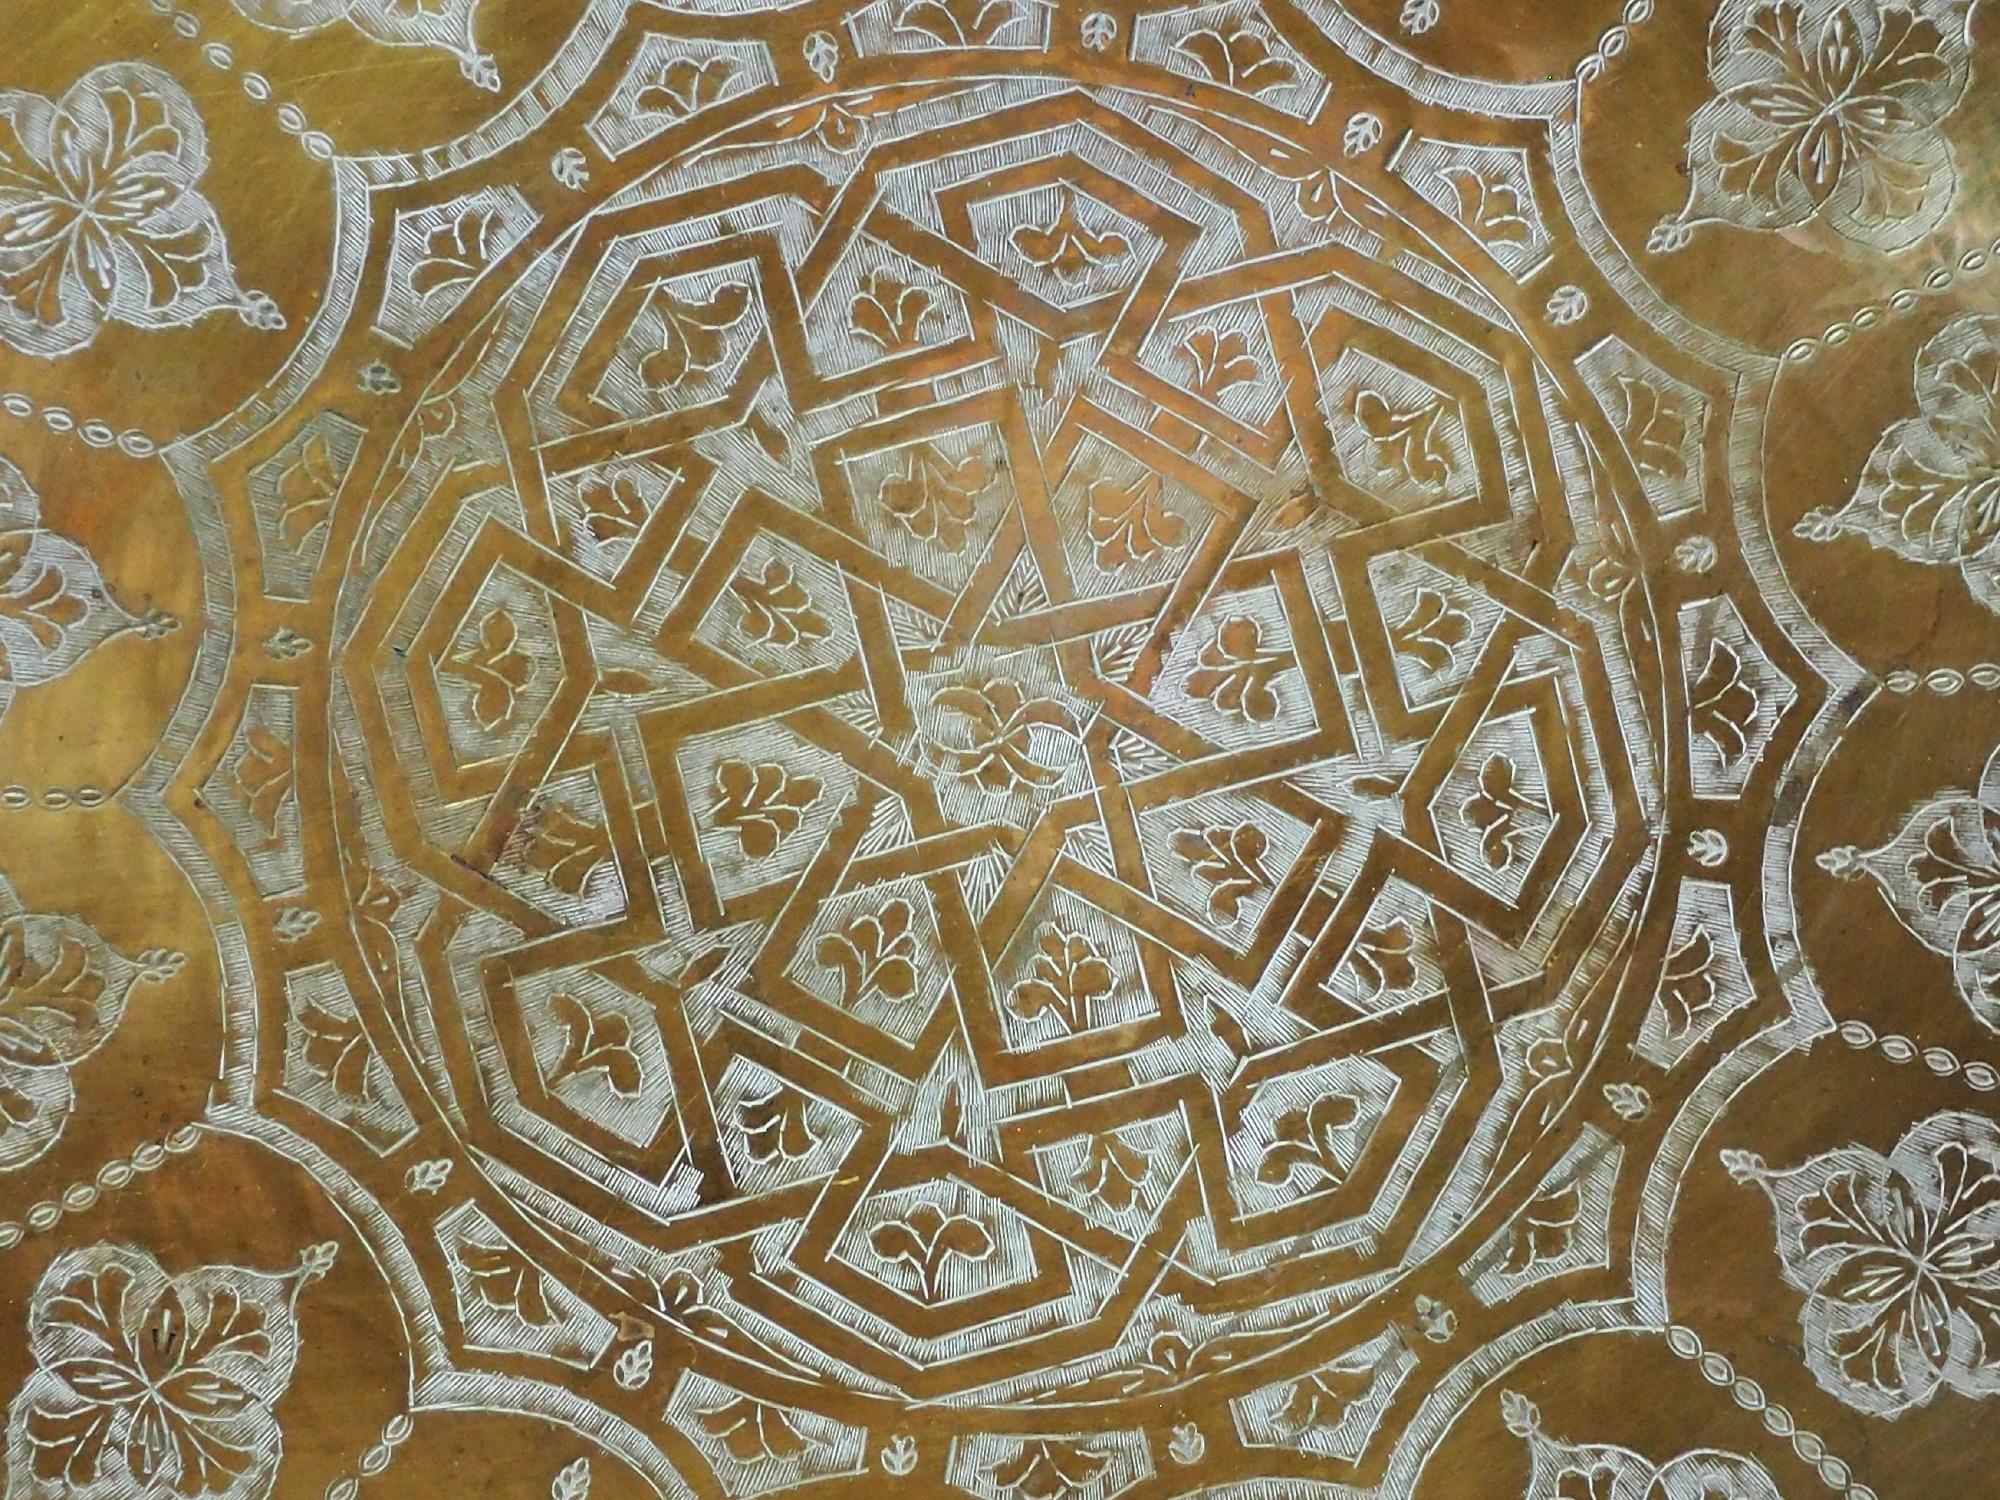 80 cm Ø  osmanisch ägyptisch marokkanisch orient Messing tablett Teetisch beisteltisch Afghanistan   21/L